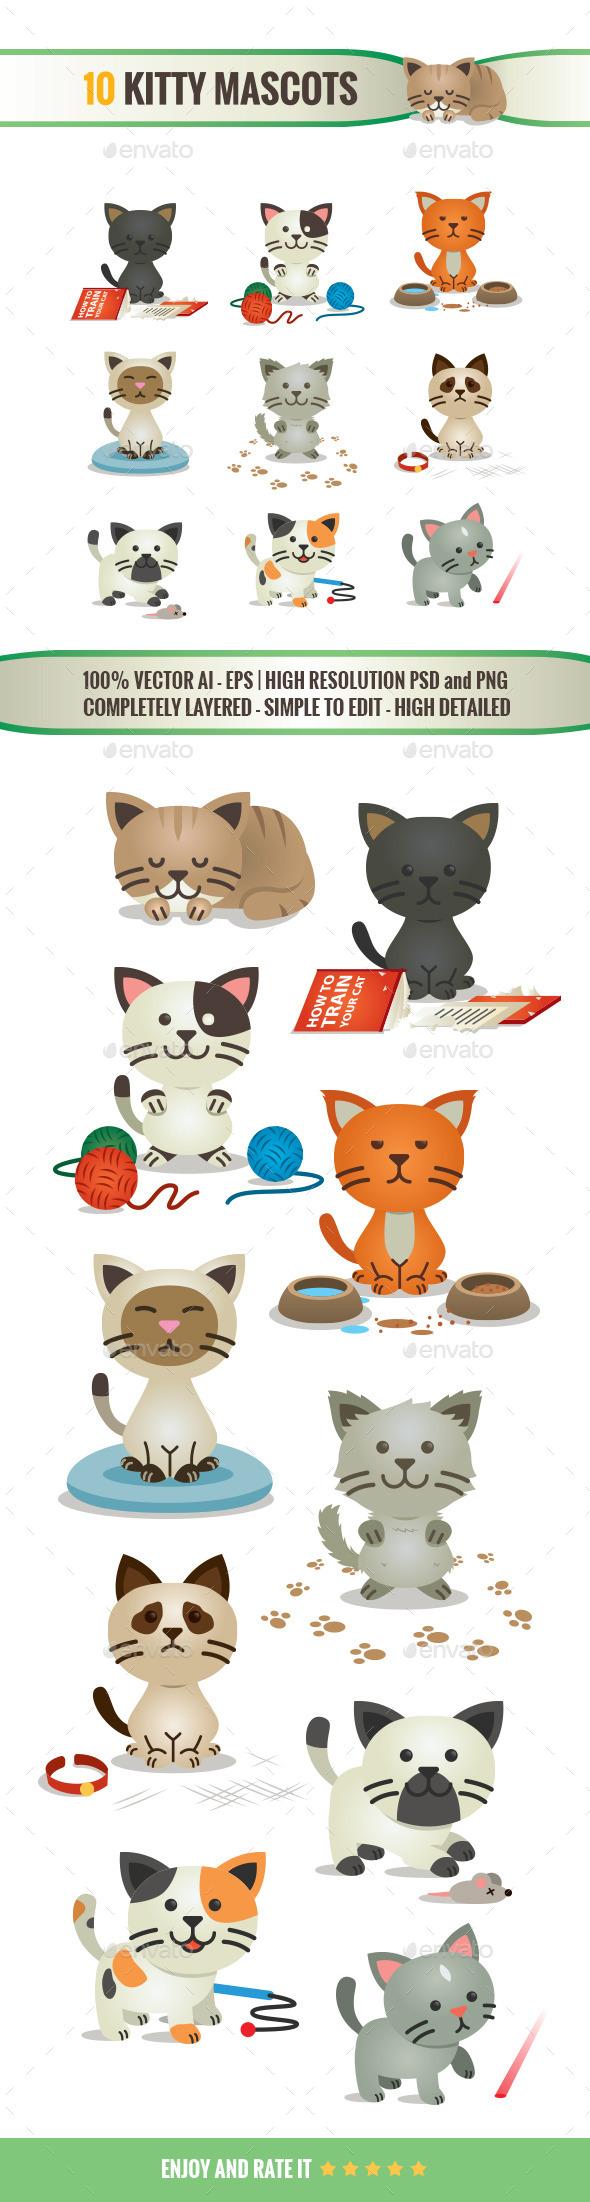 10 Kitty Mascots - Animals Characters